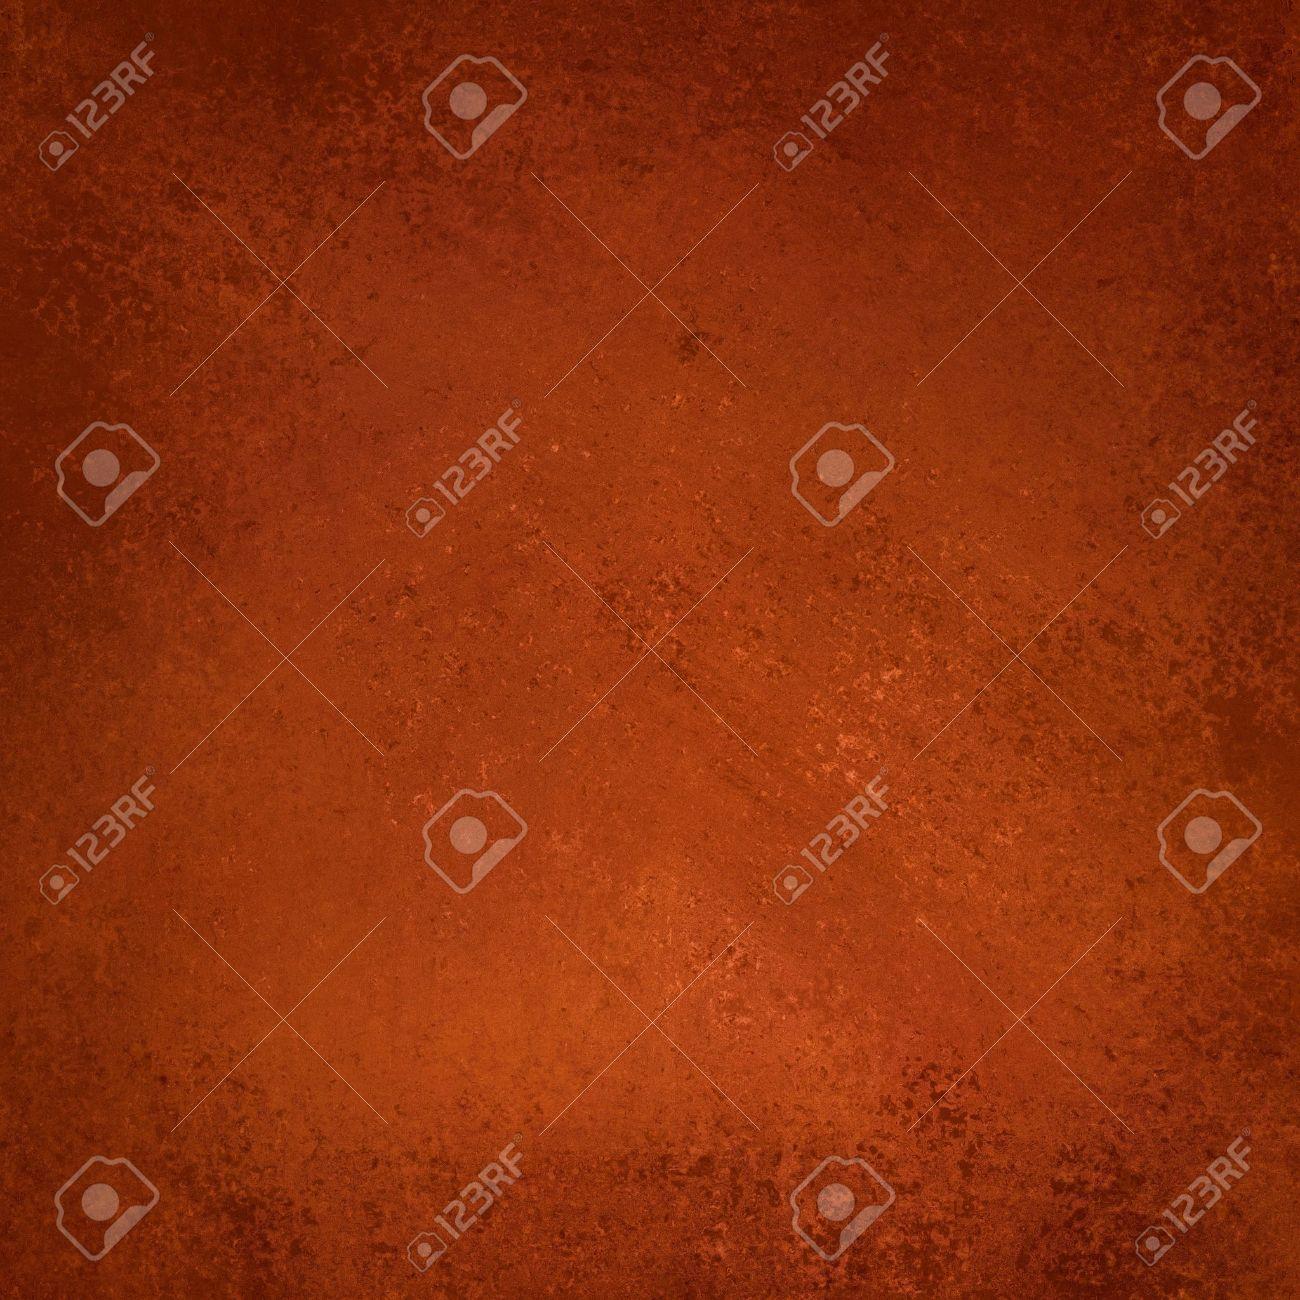 dark red orange background image. halloween background color. - 51329162